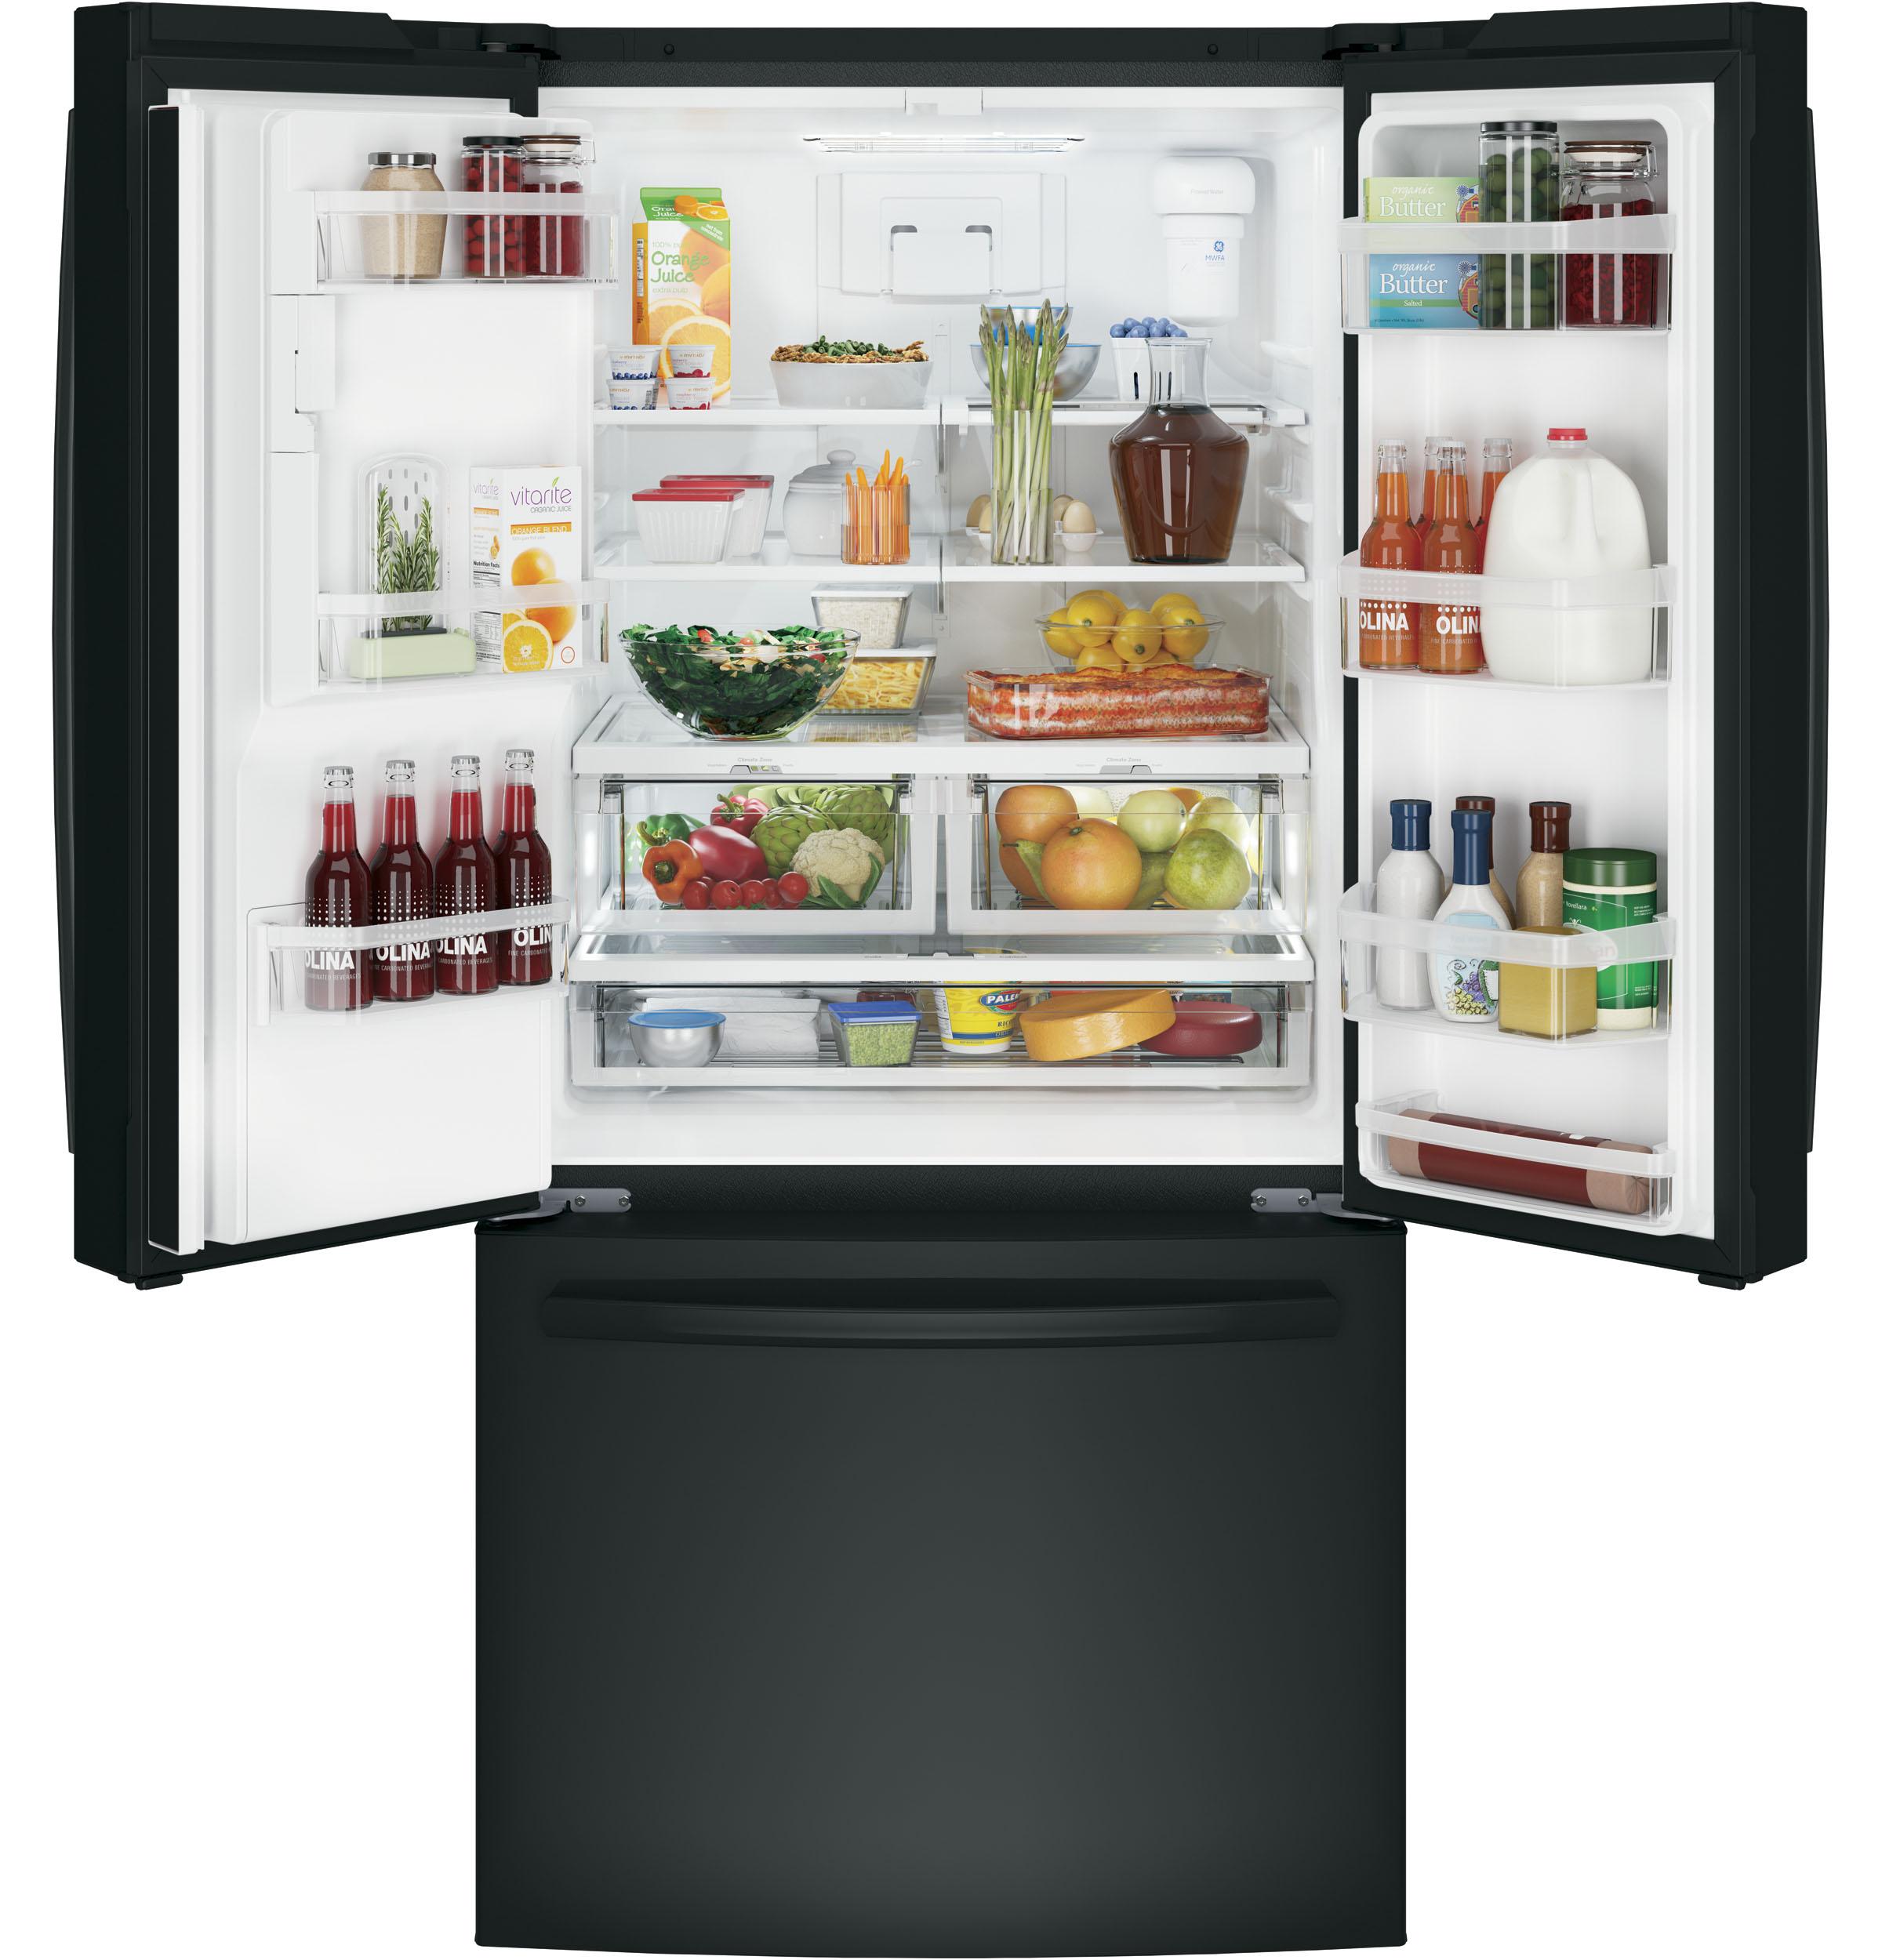 GE Appliances GFE24JGKBB 23.8 cu. ft. French Door Refrigerator - Black